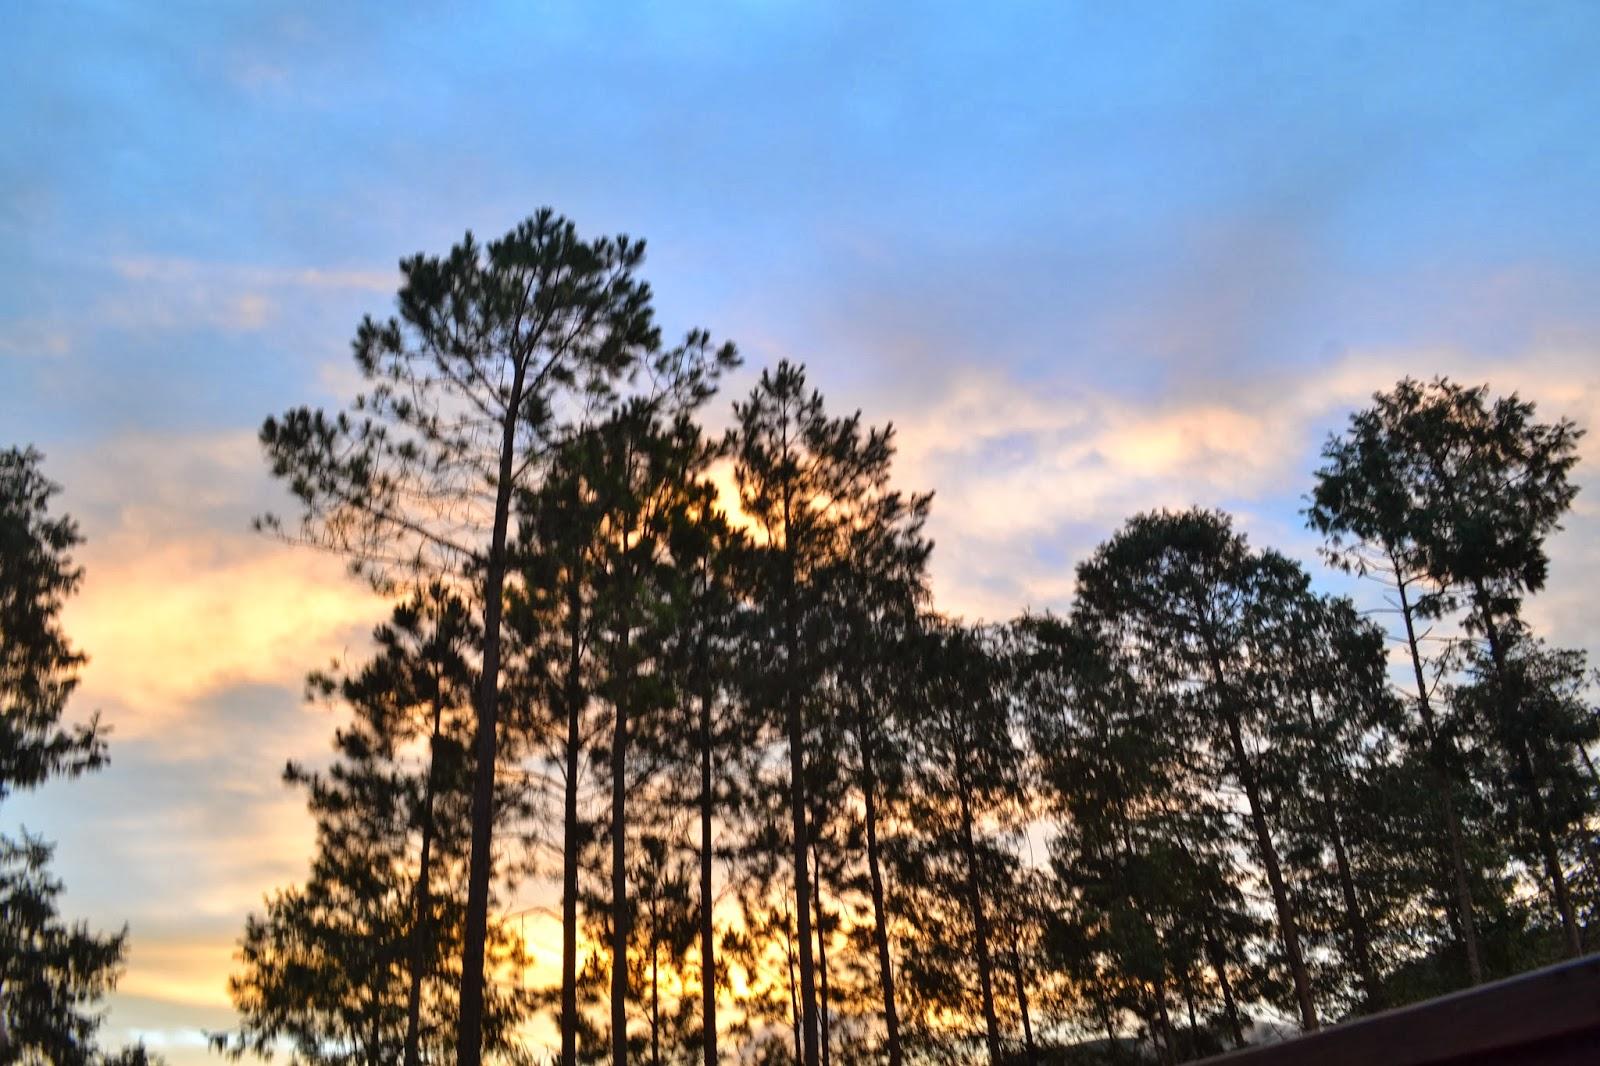 Sunset sky through the trees